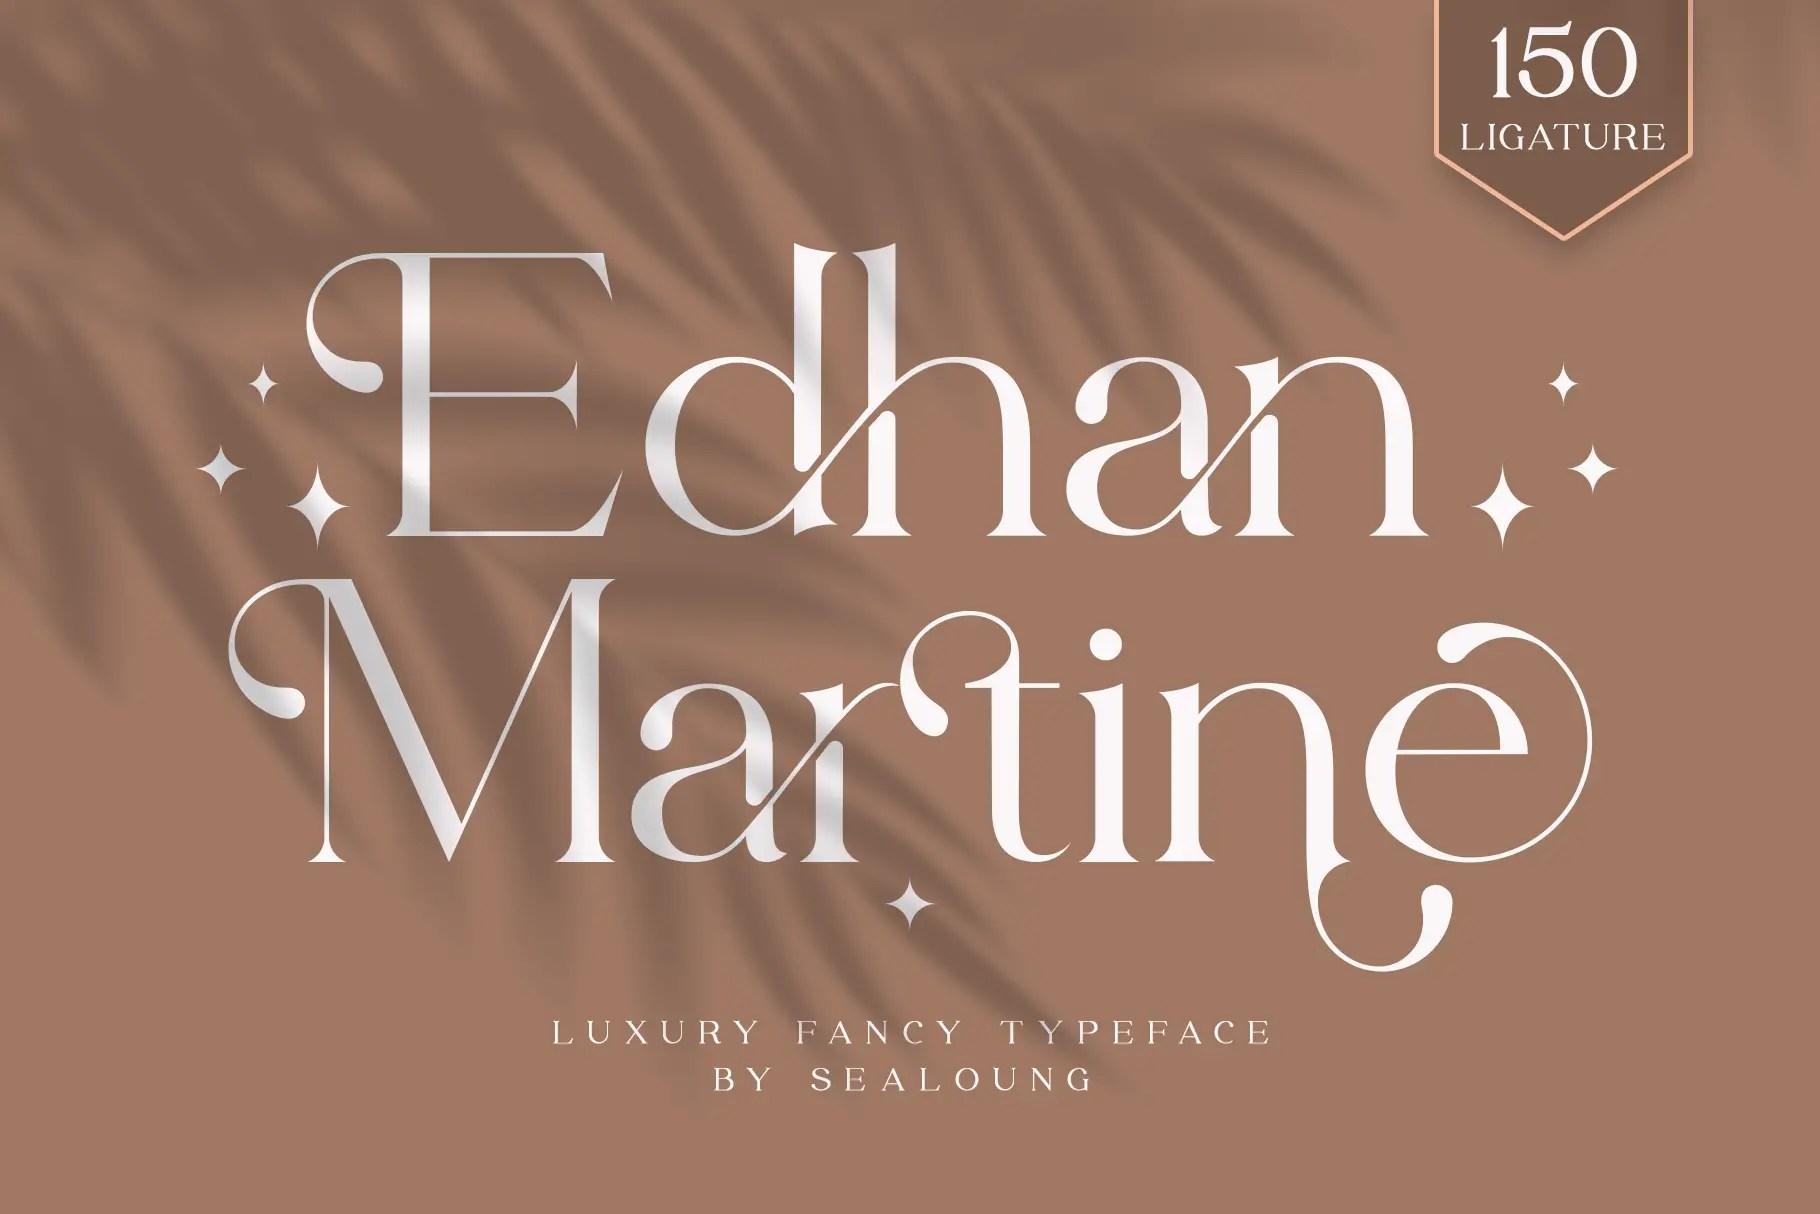 Edhan Martine Serif Font -1